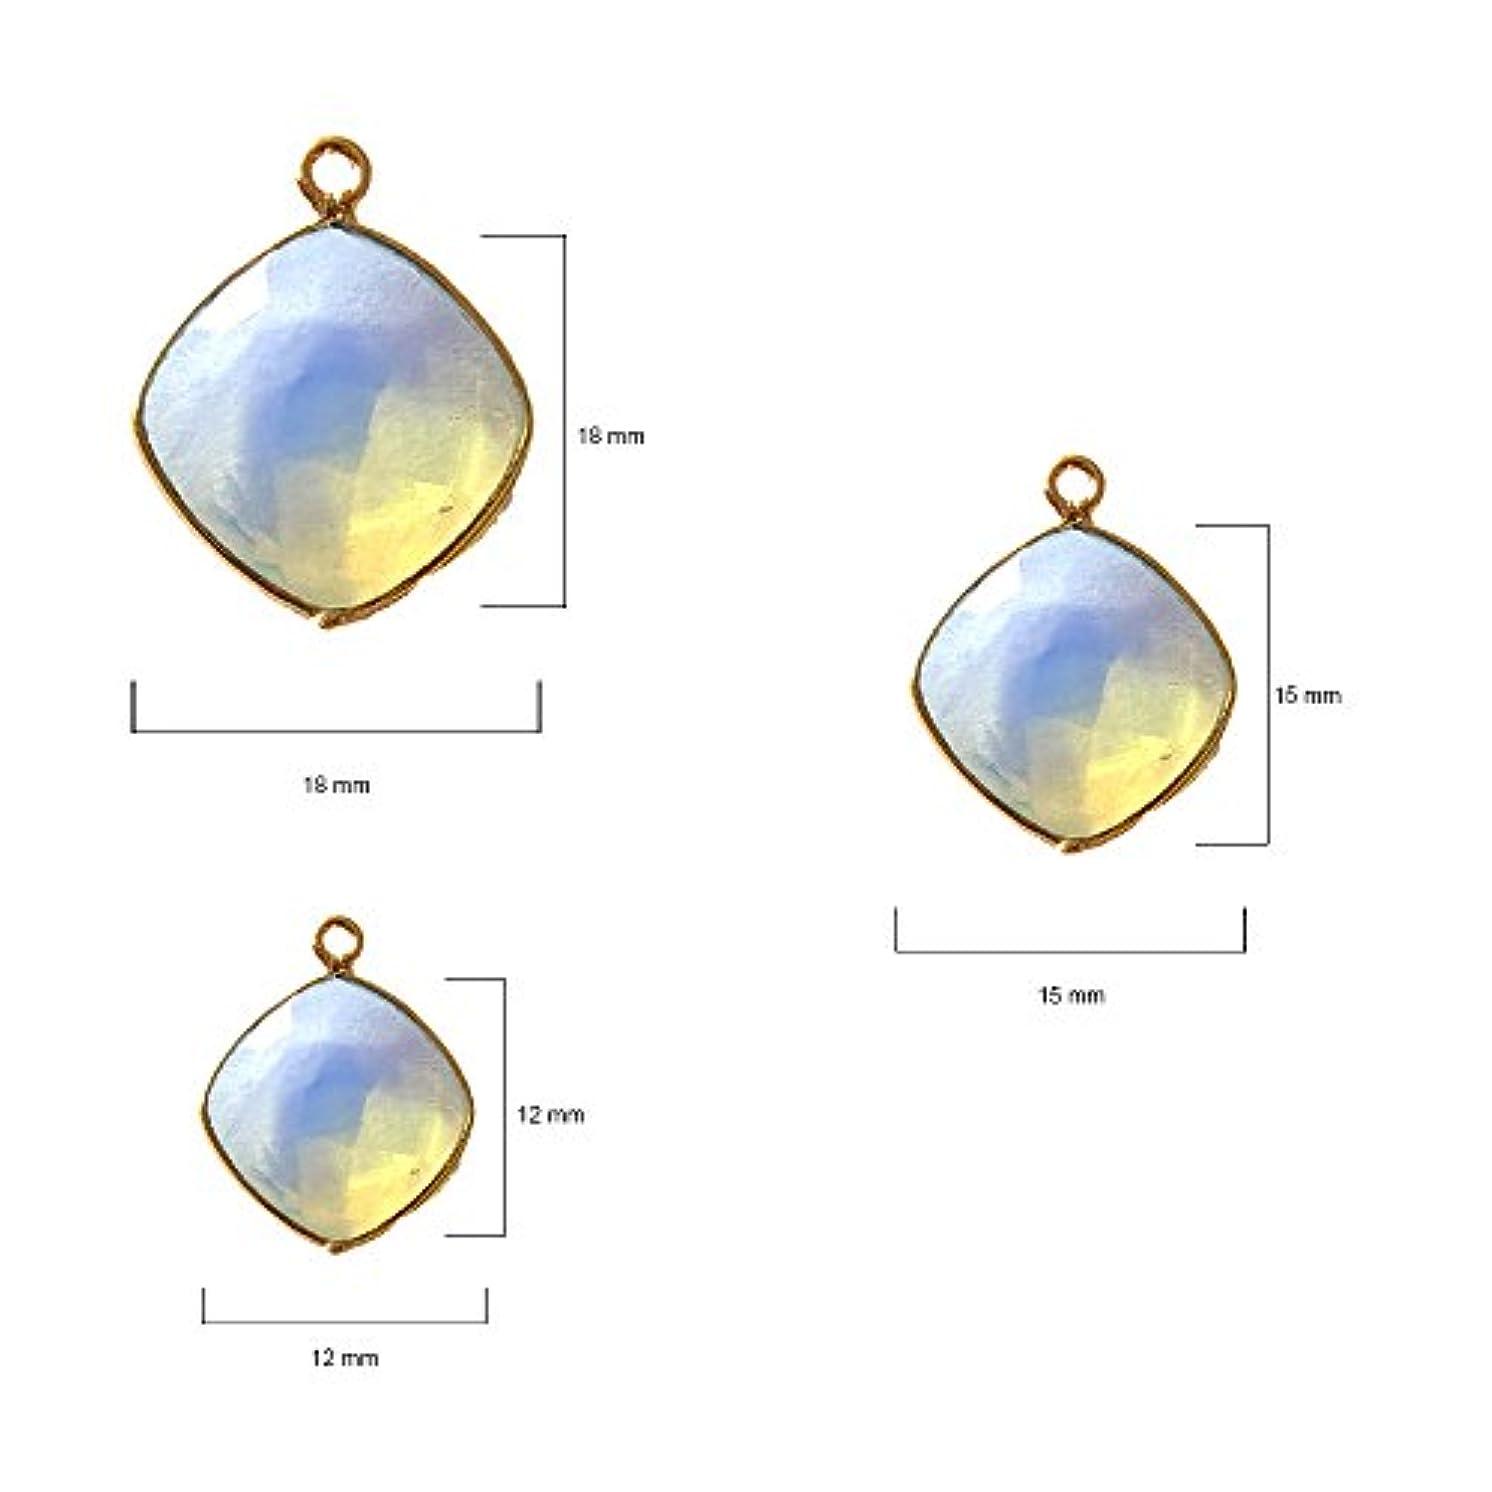 4 Pcs Opalite Cushion Beads 12mm 24K Gold Vermeil by BESTINBEADS, Opalite Hydro Quartz Cushion Pendant Bezel Gemstone Connectors Over 925 Sterling Silver Bezel Jewelry Making Supplies